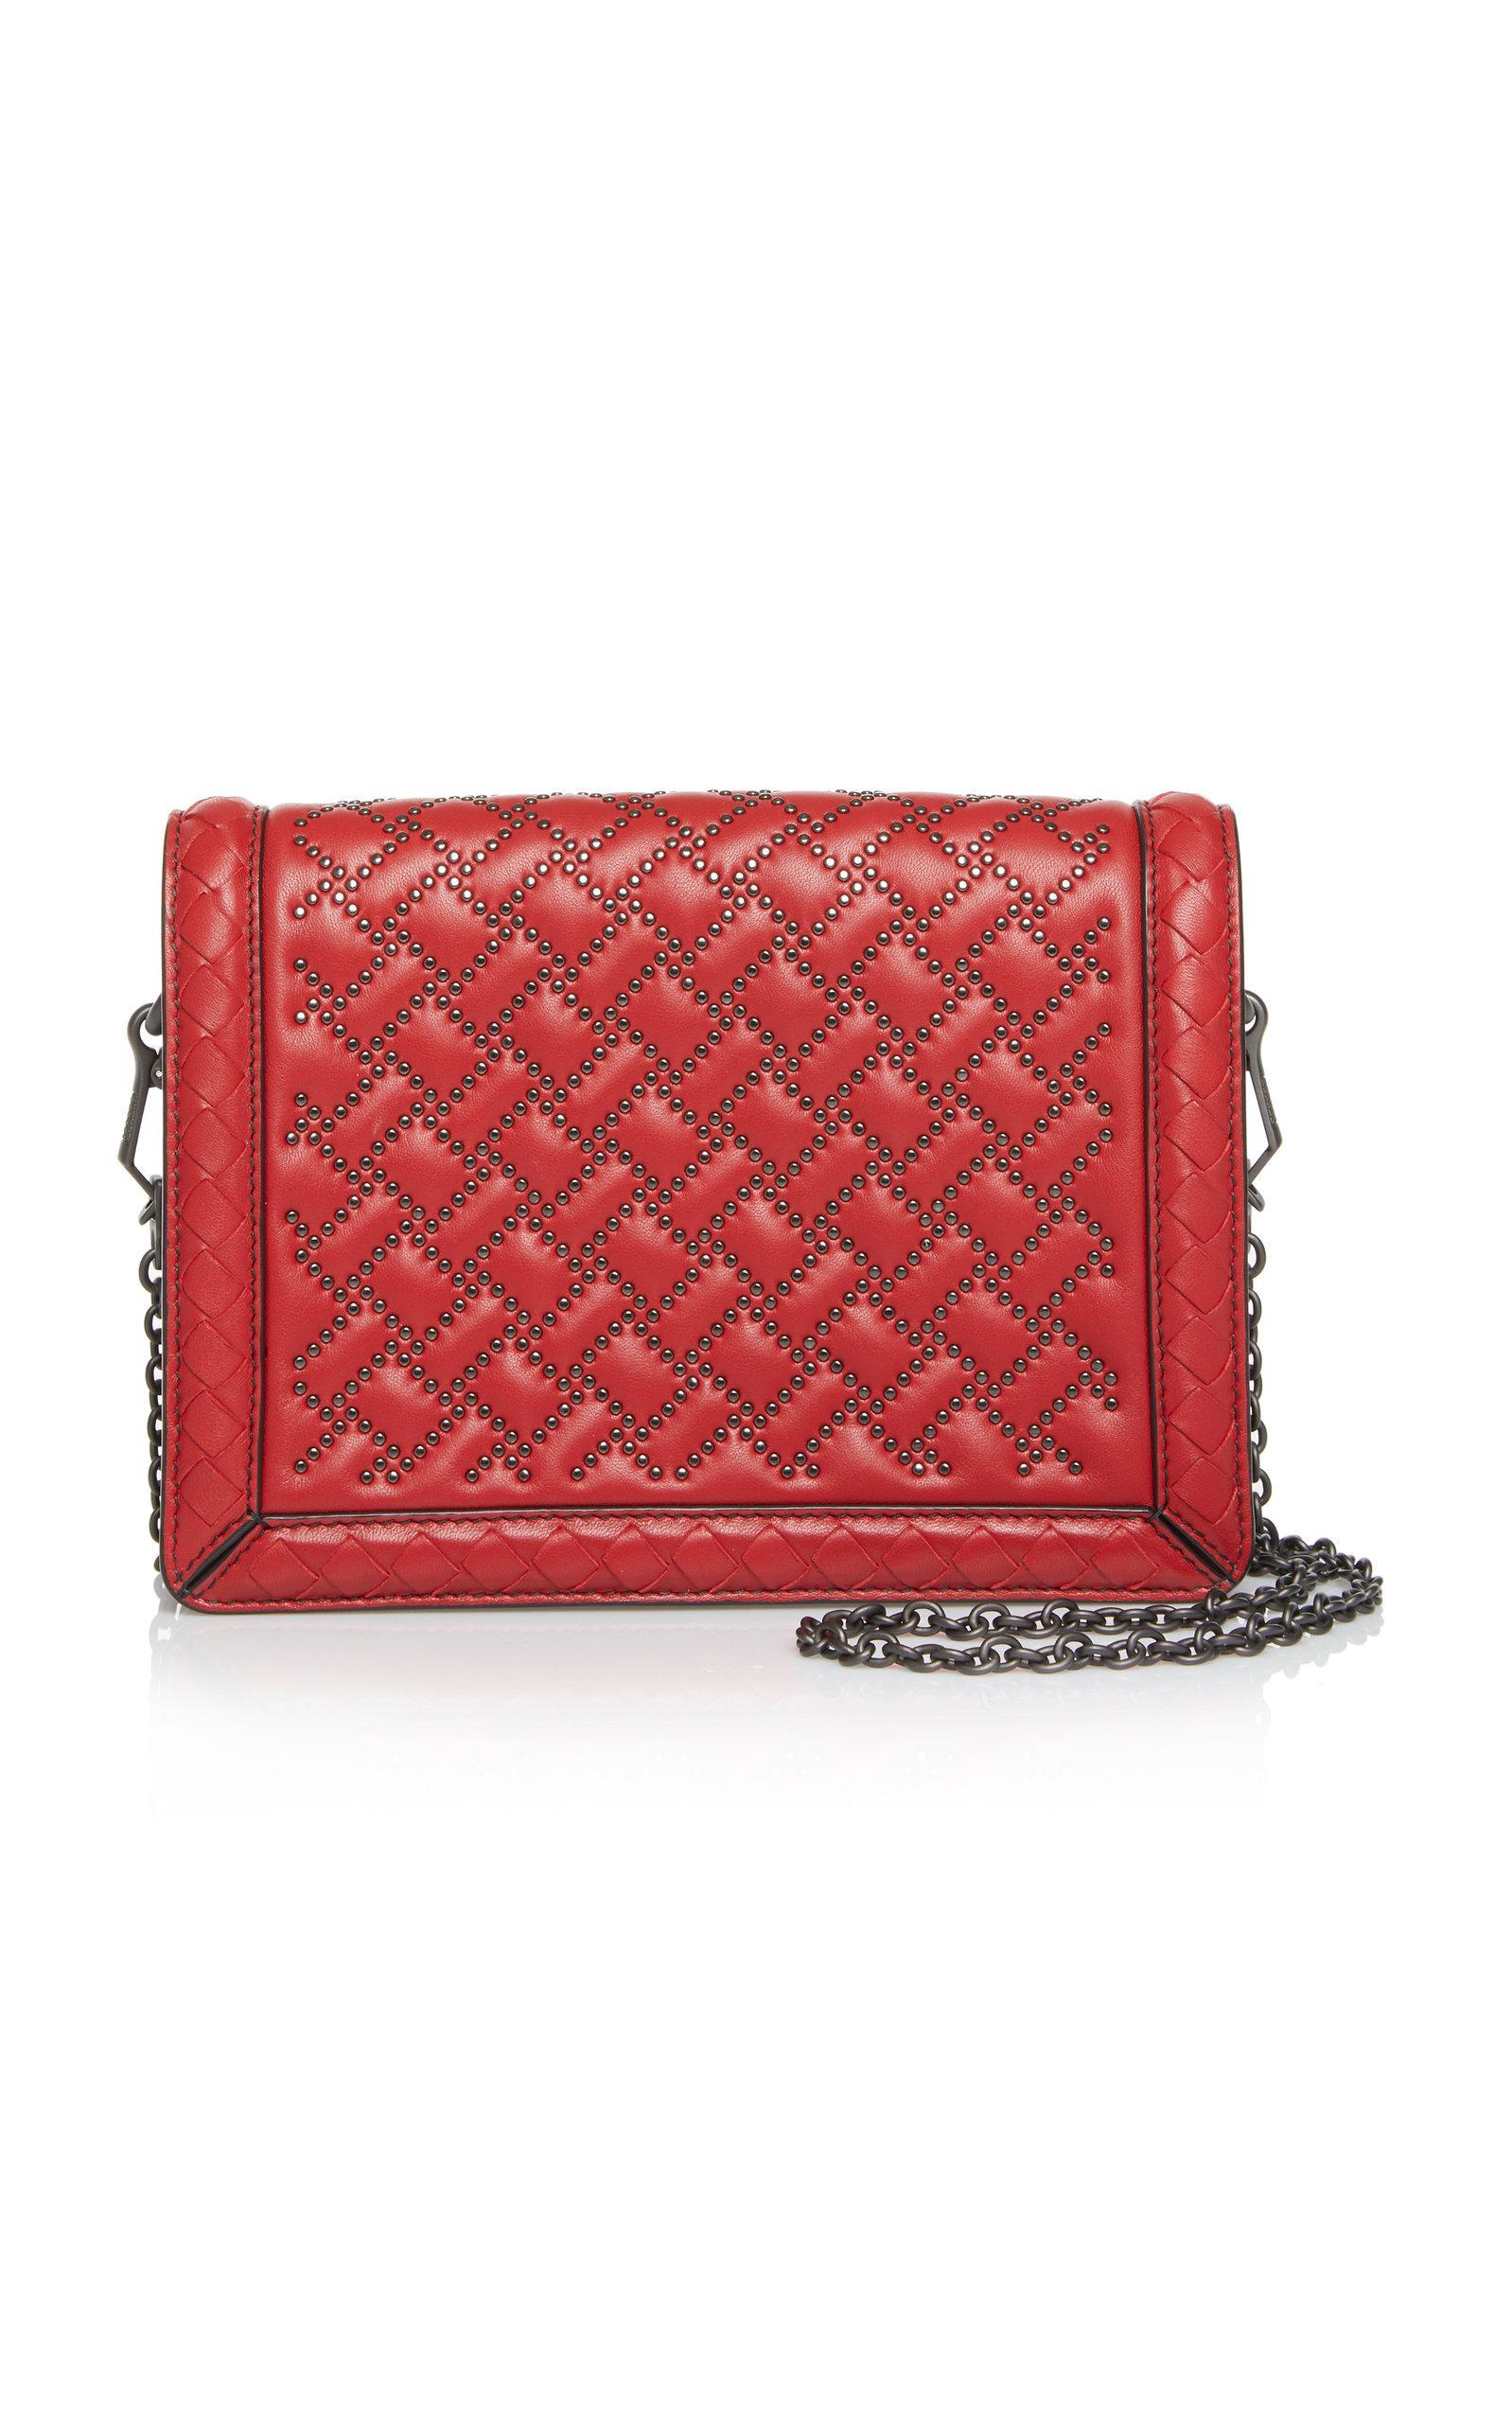 Bottega Veneta Mini Montebello Microstud Leather Shoulder Bag In Red